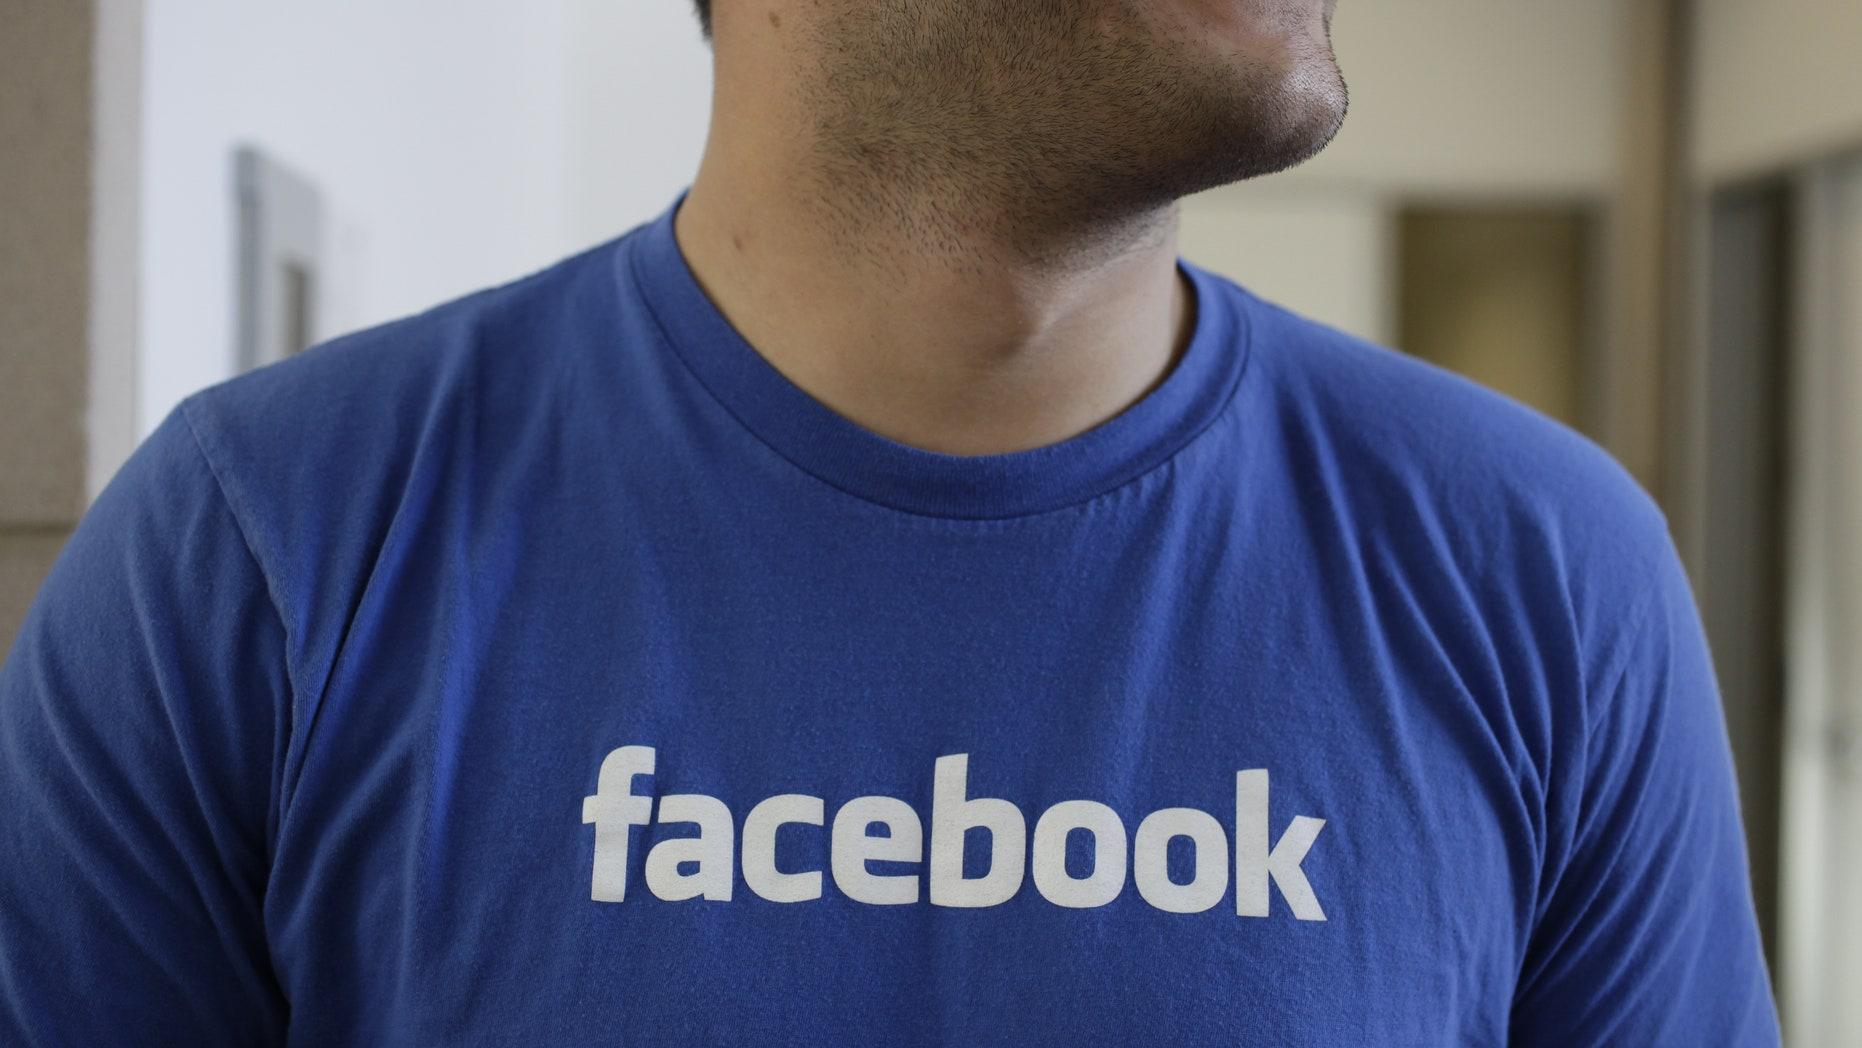 Feb. 8, 2012: A Facebook worker smiling inside Facebook headquarters in Menlo Park, Calif.